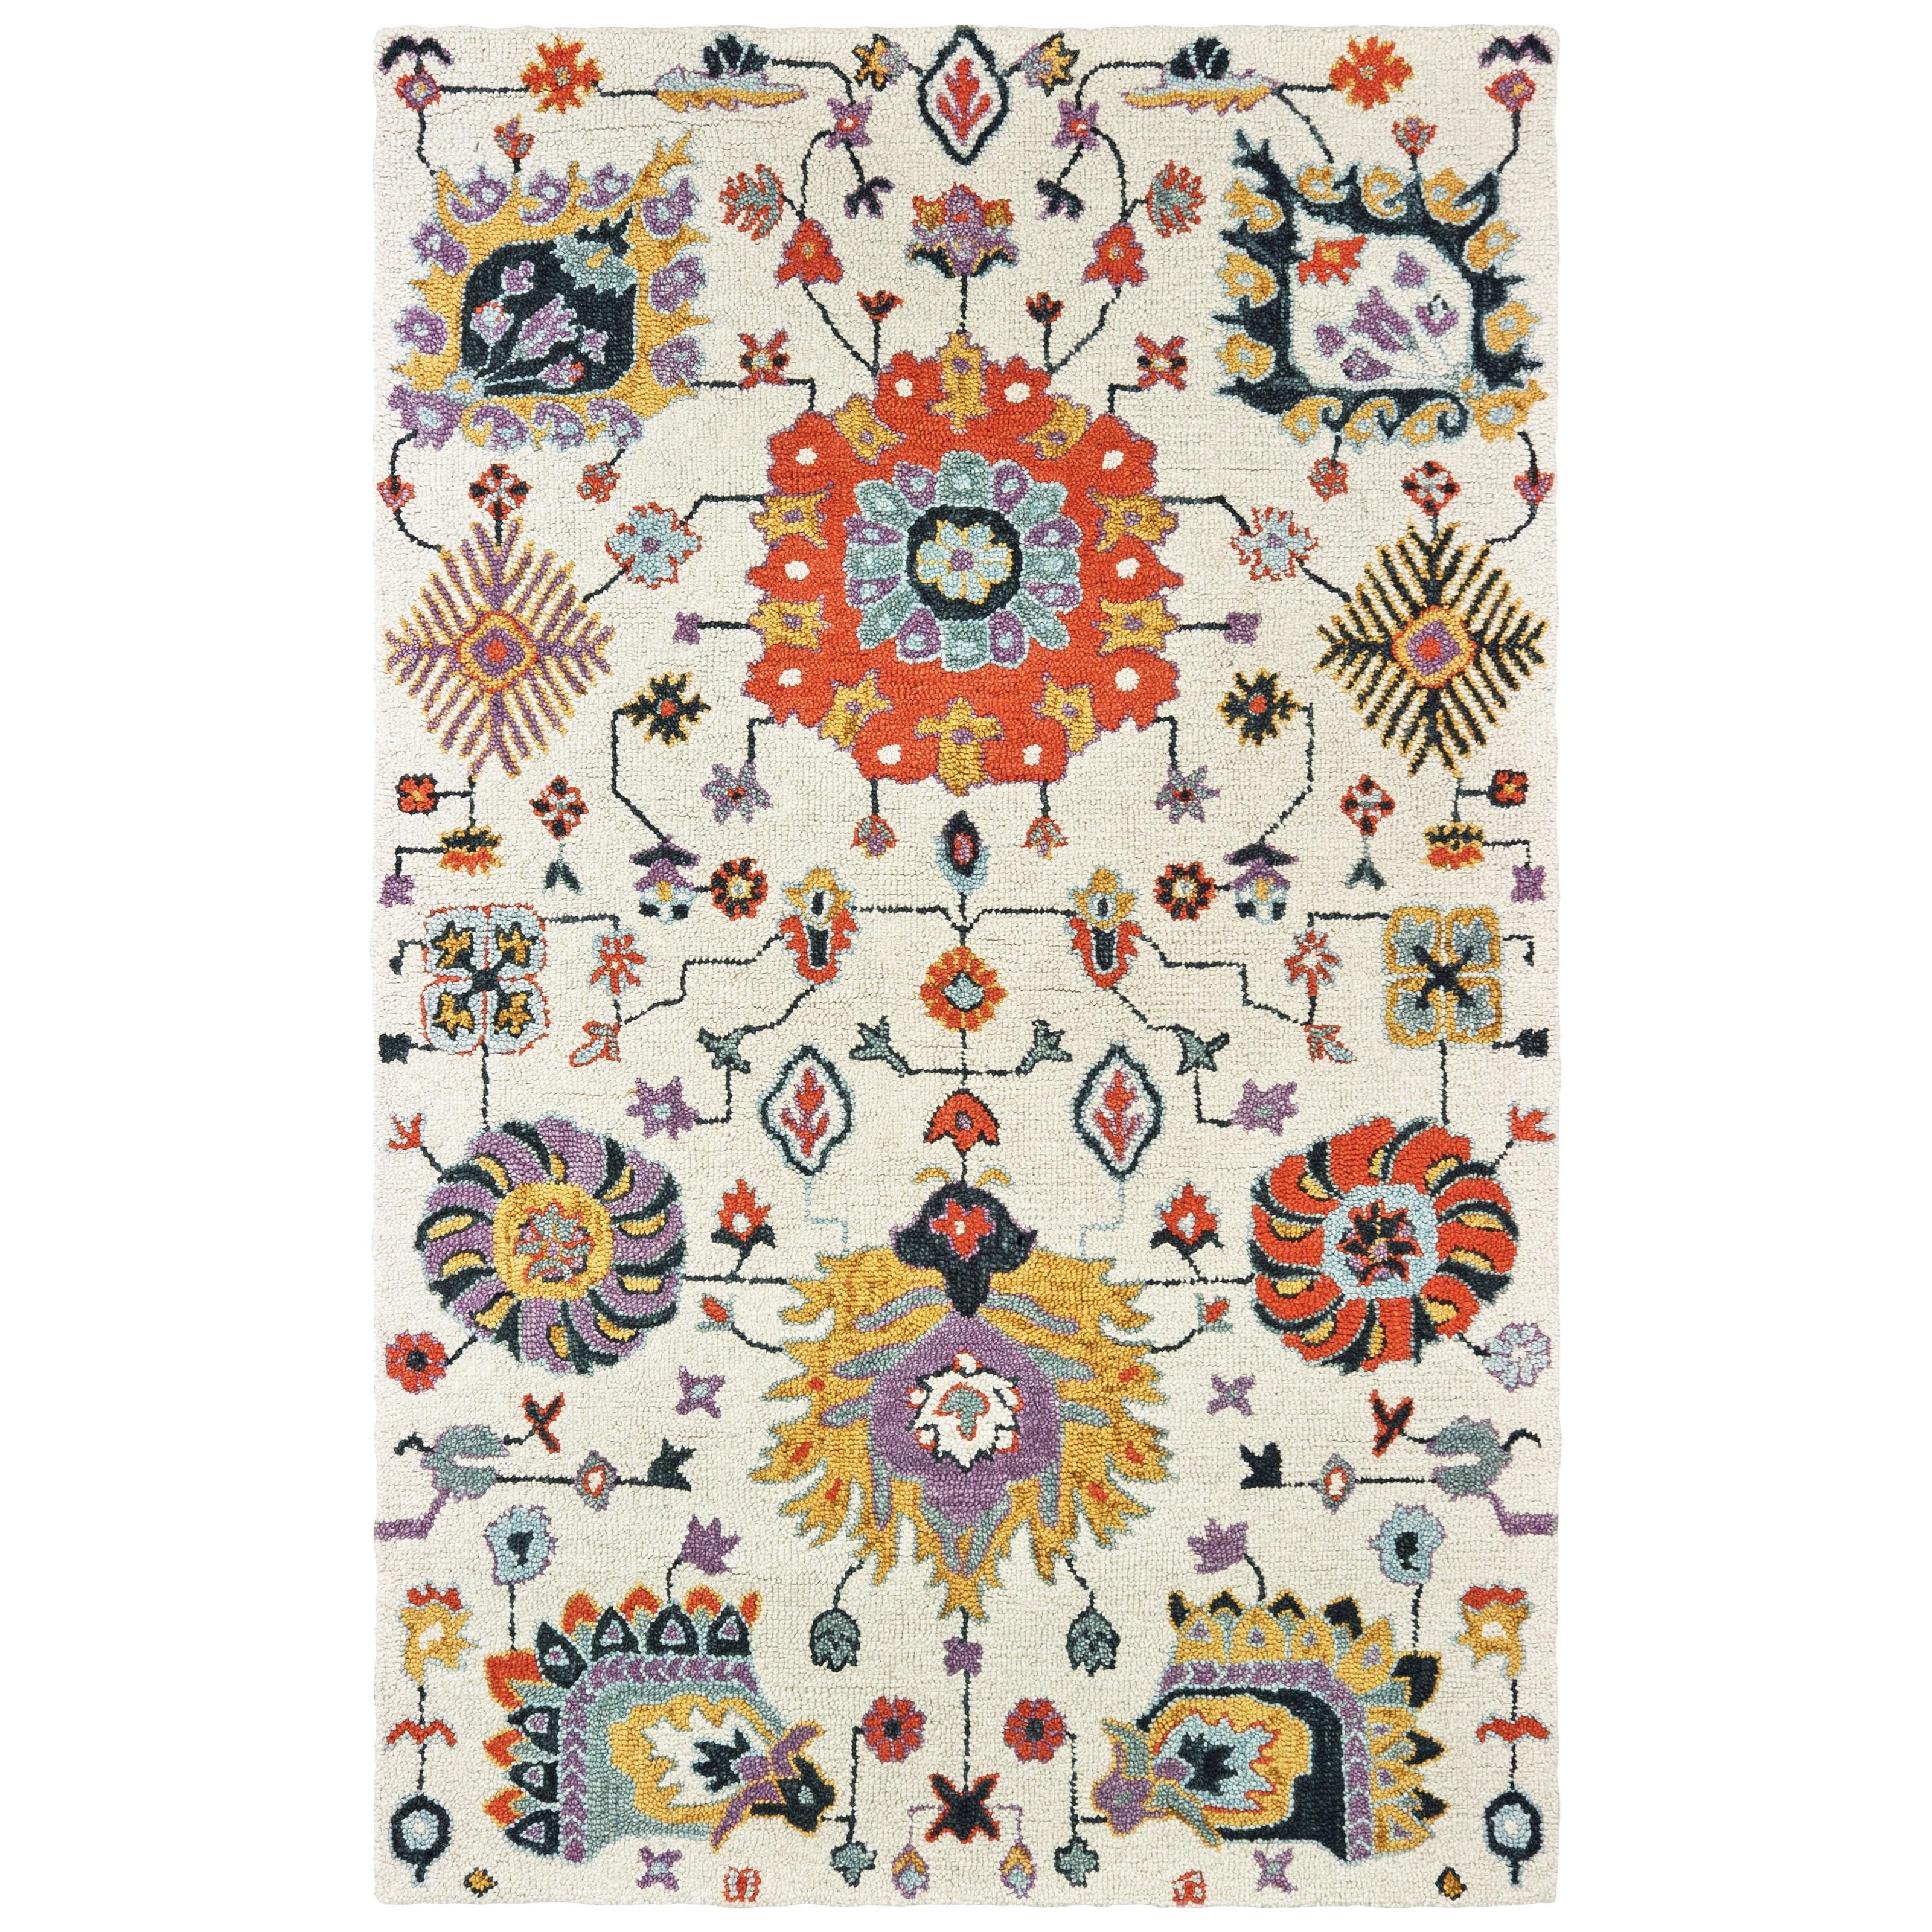 Zahra 10' X 13' Rectangle Rug by Oriental Weavers at Lucas Furniture & Mattress